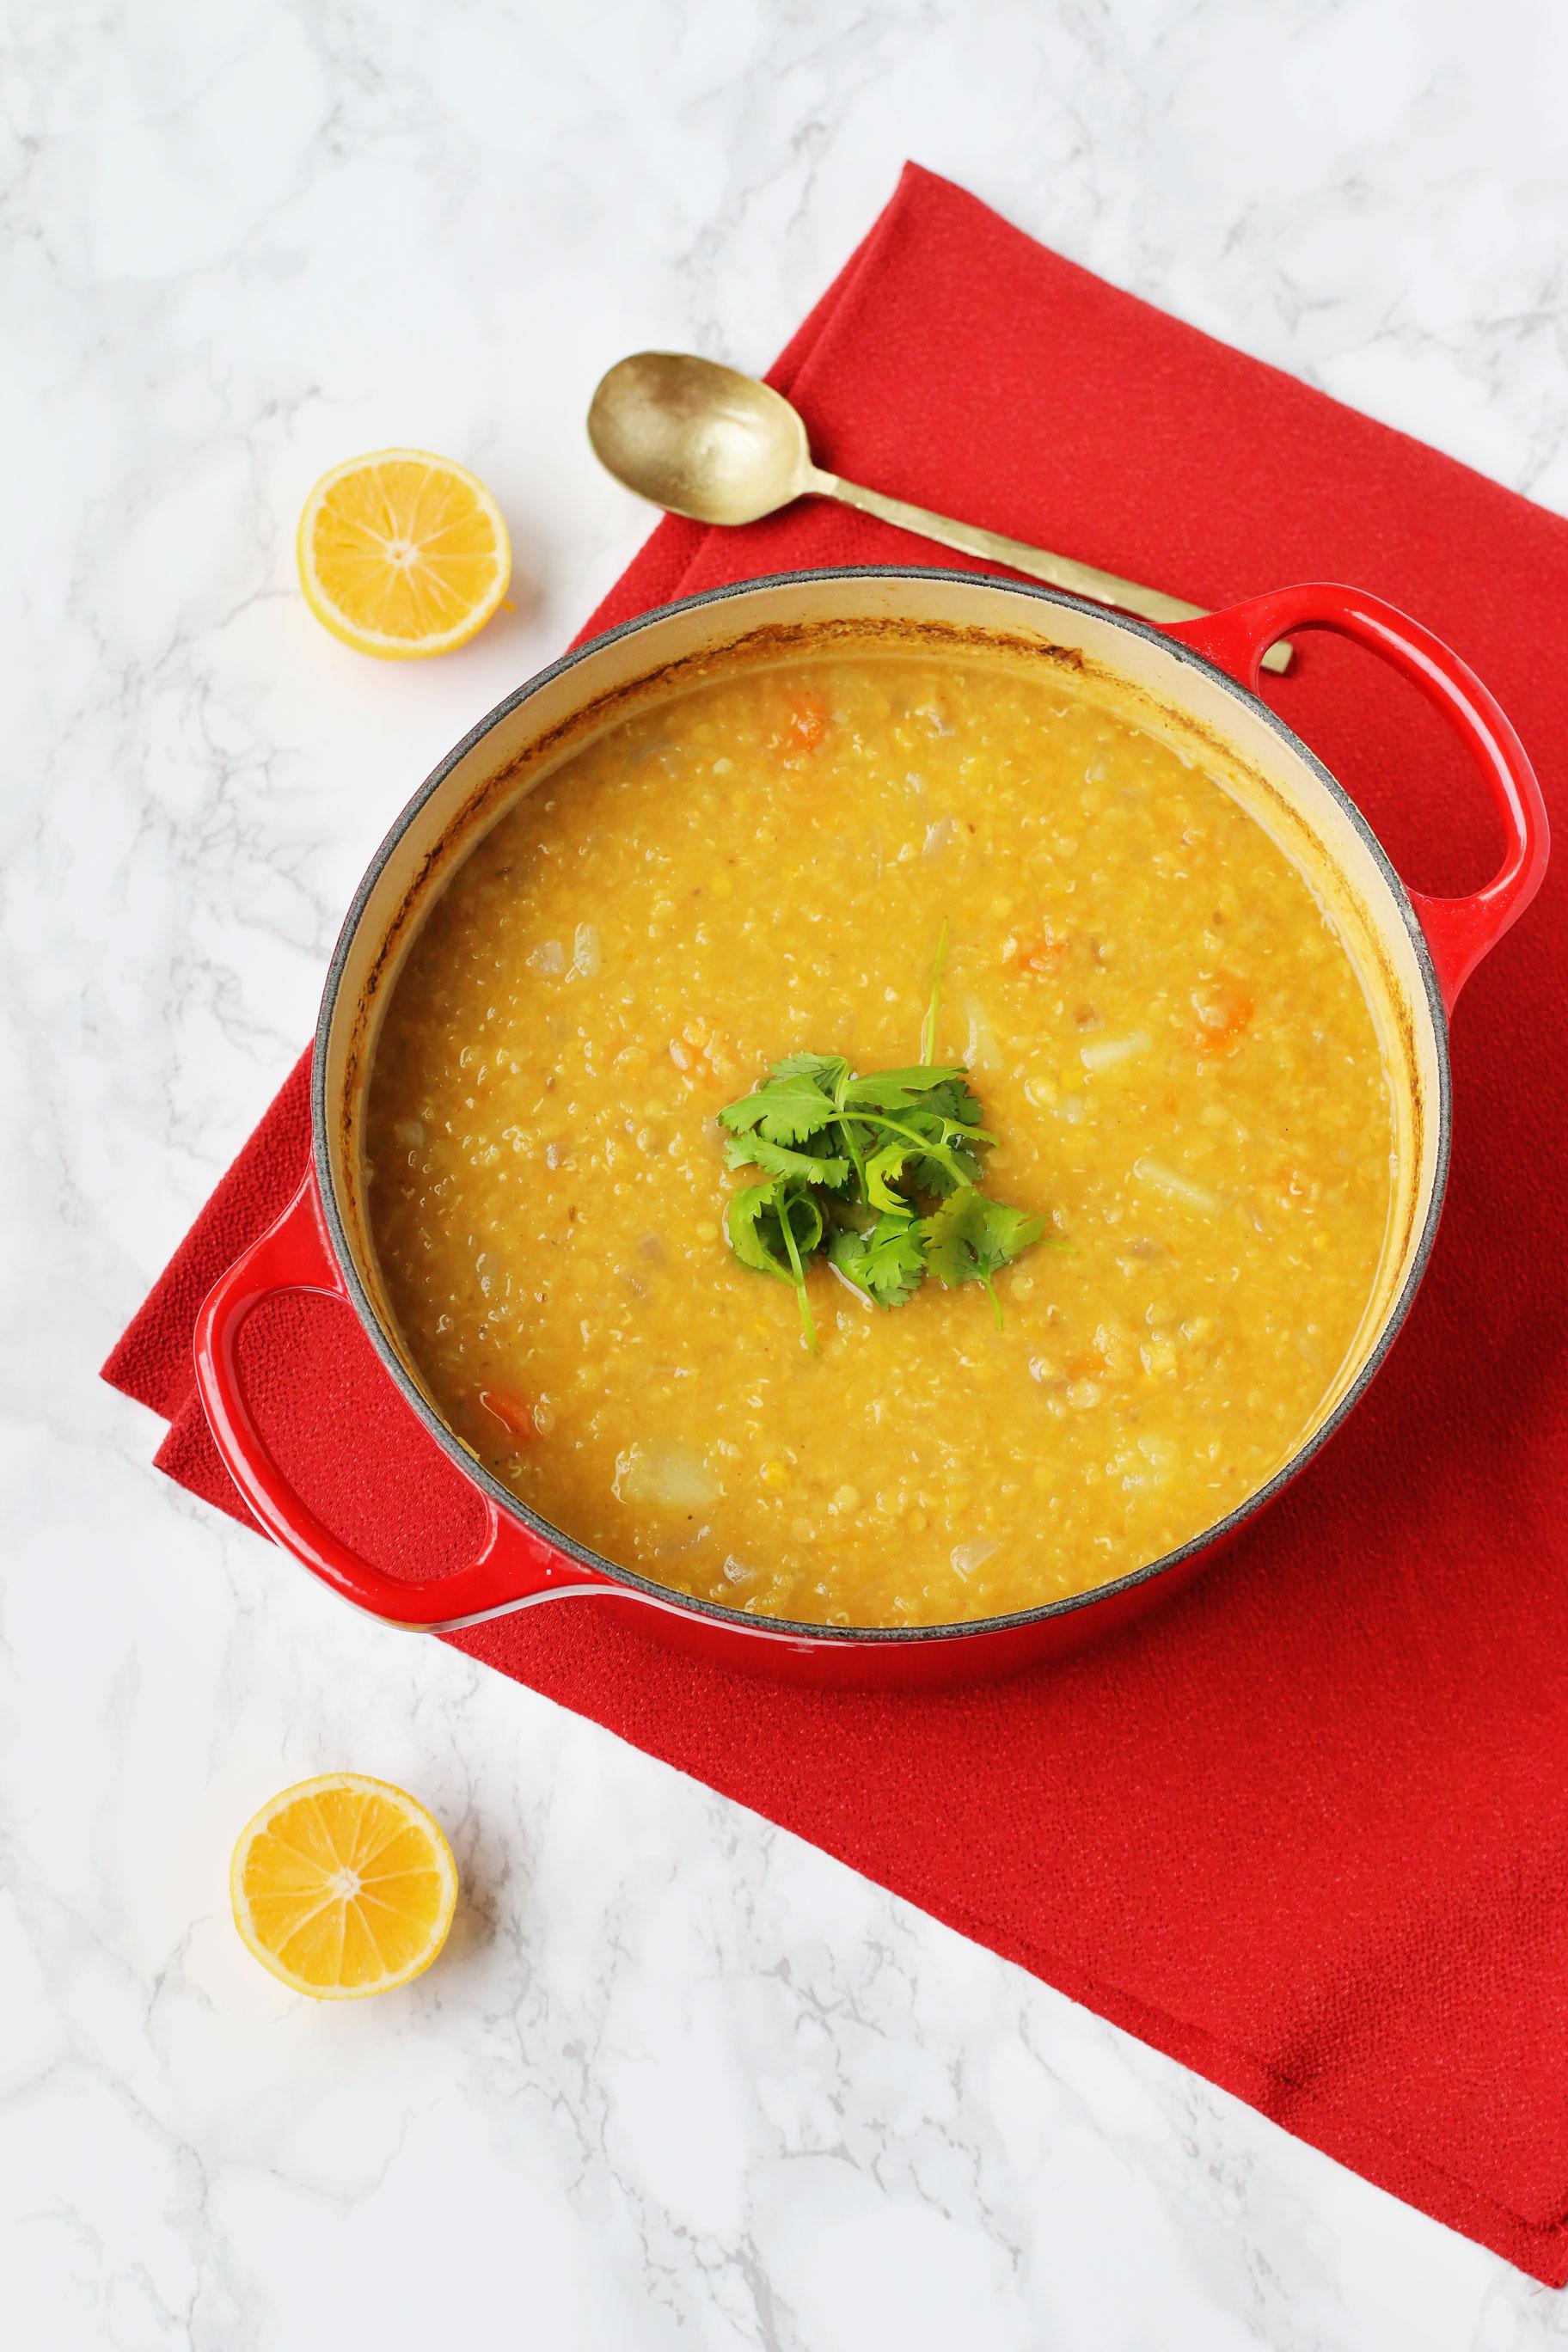 her-cookbook-club-thug-kitchen-eat-like-you-give-a-fuck-cookbook-lemon-lentil-soup